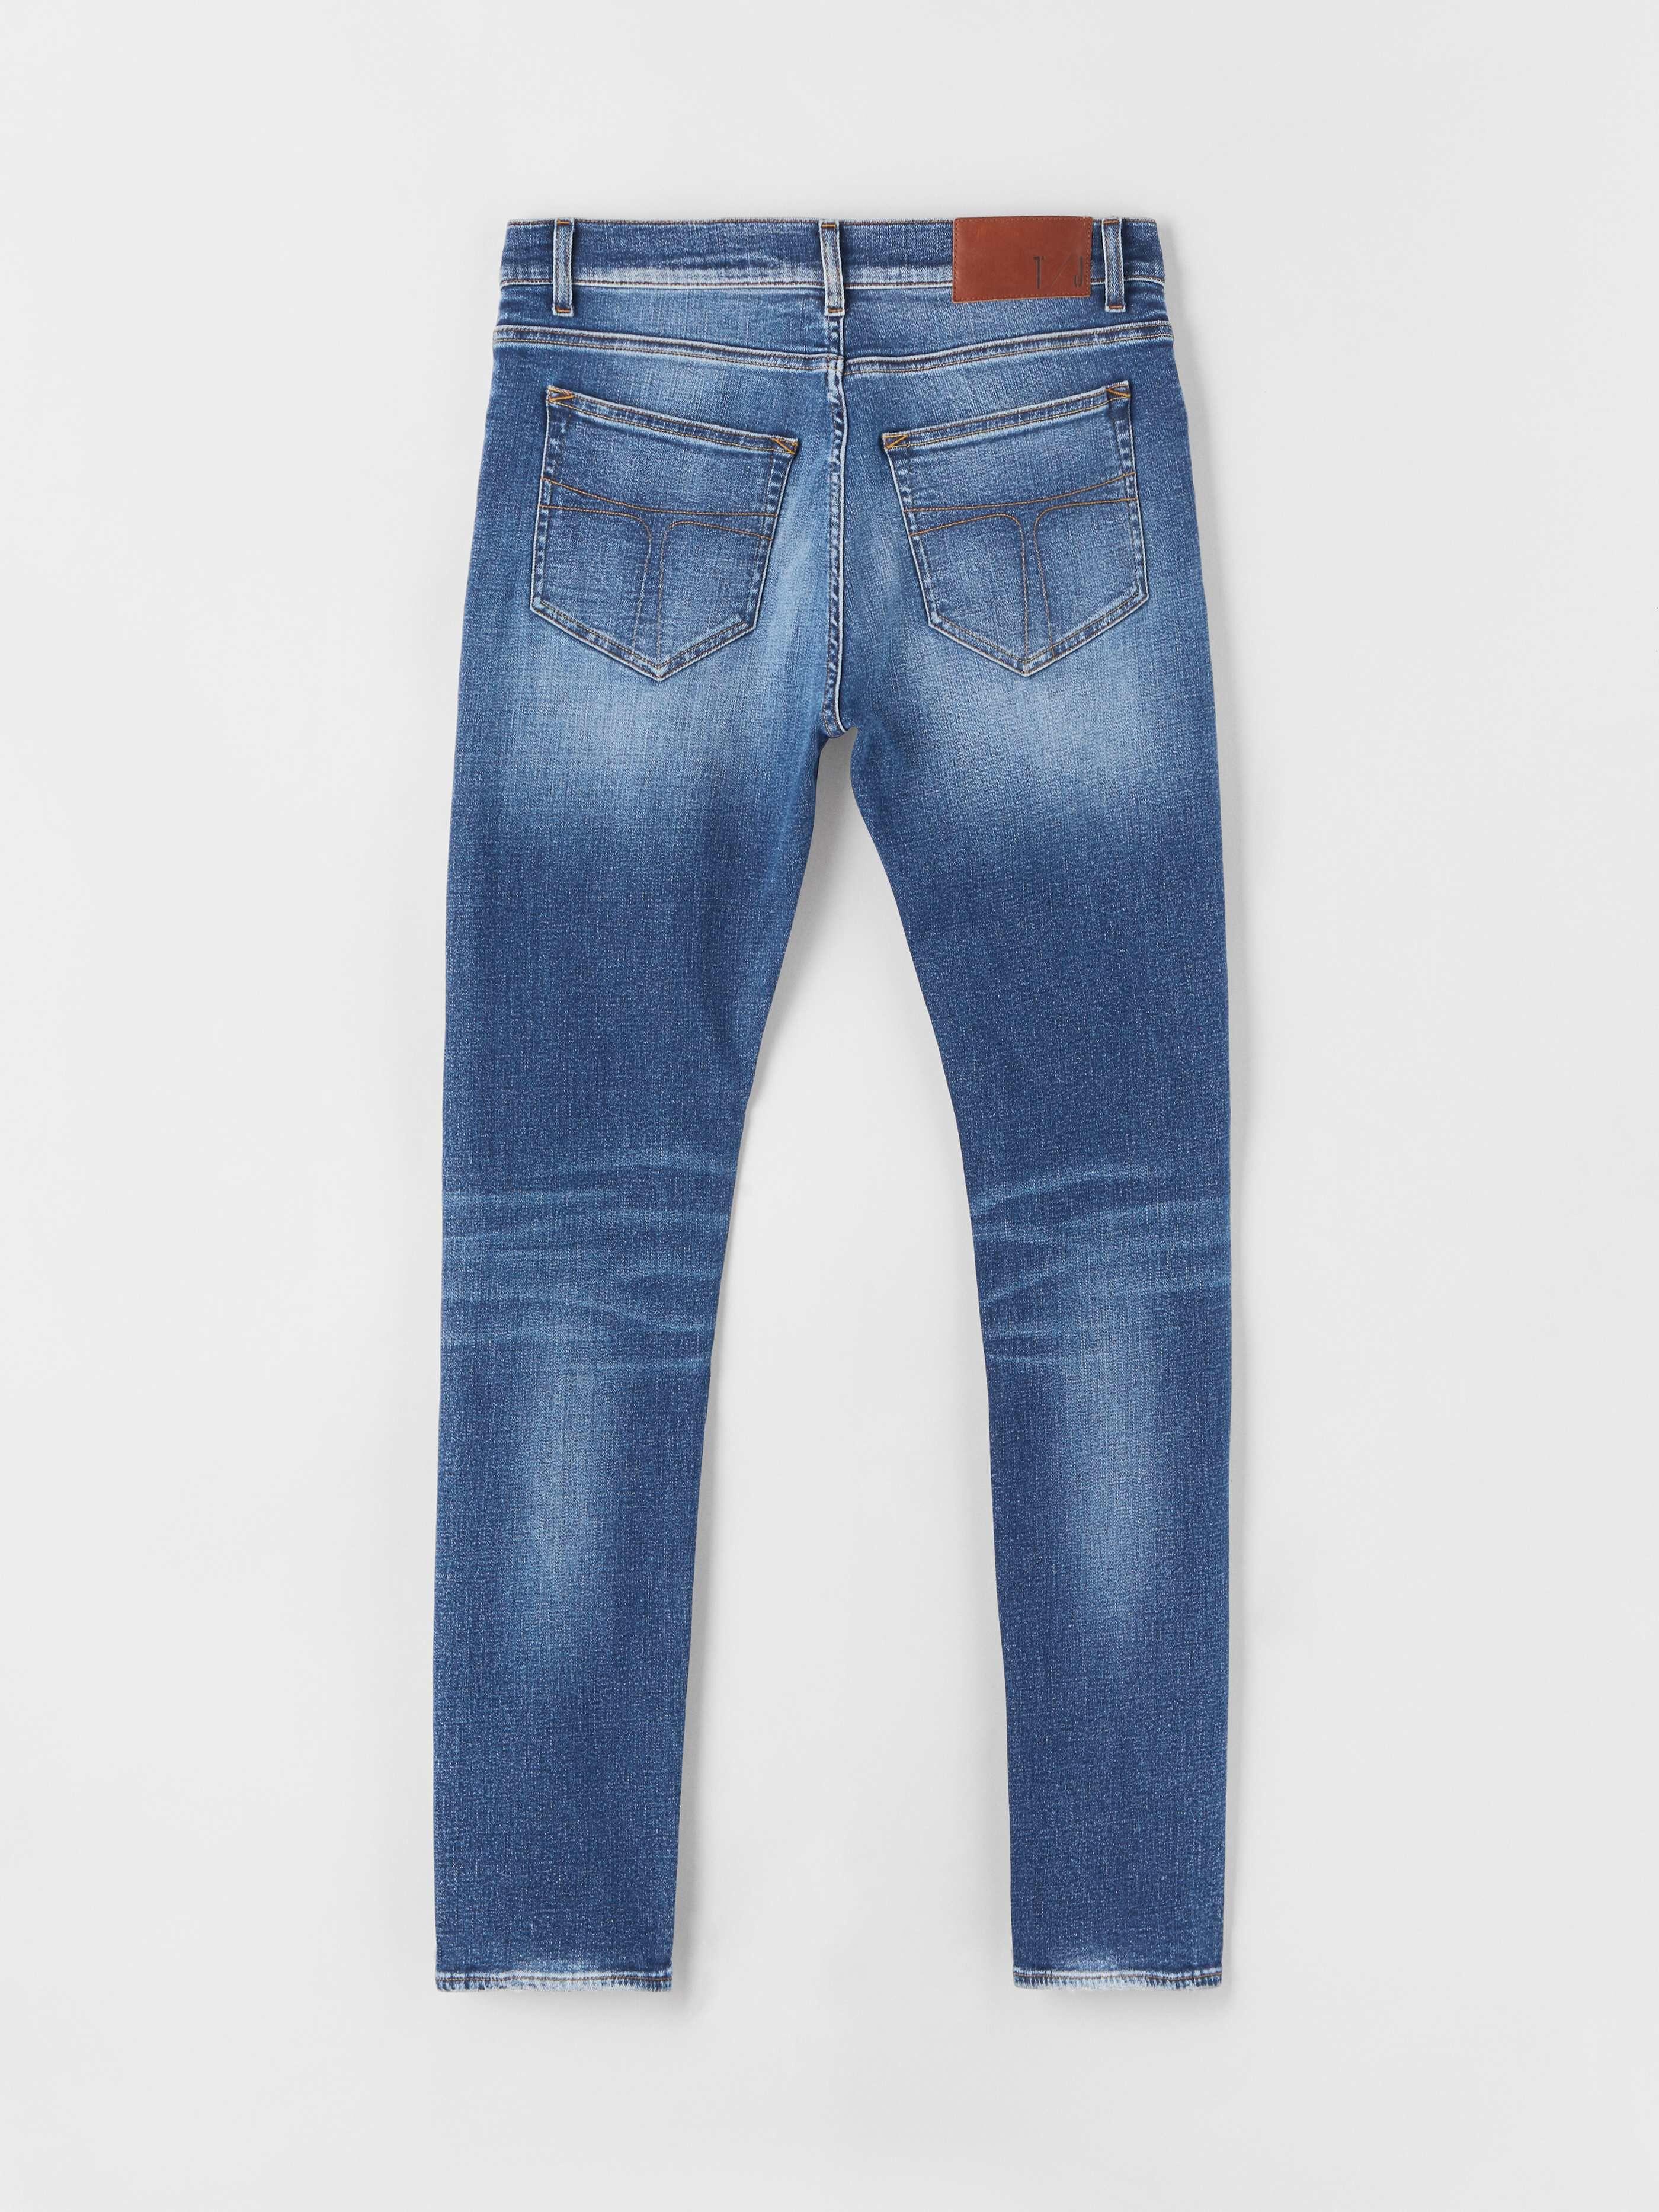 Evolve Jeans Buy Men online